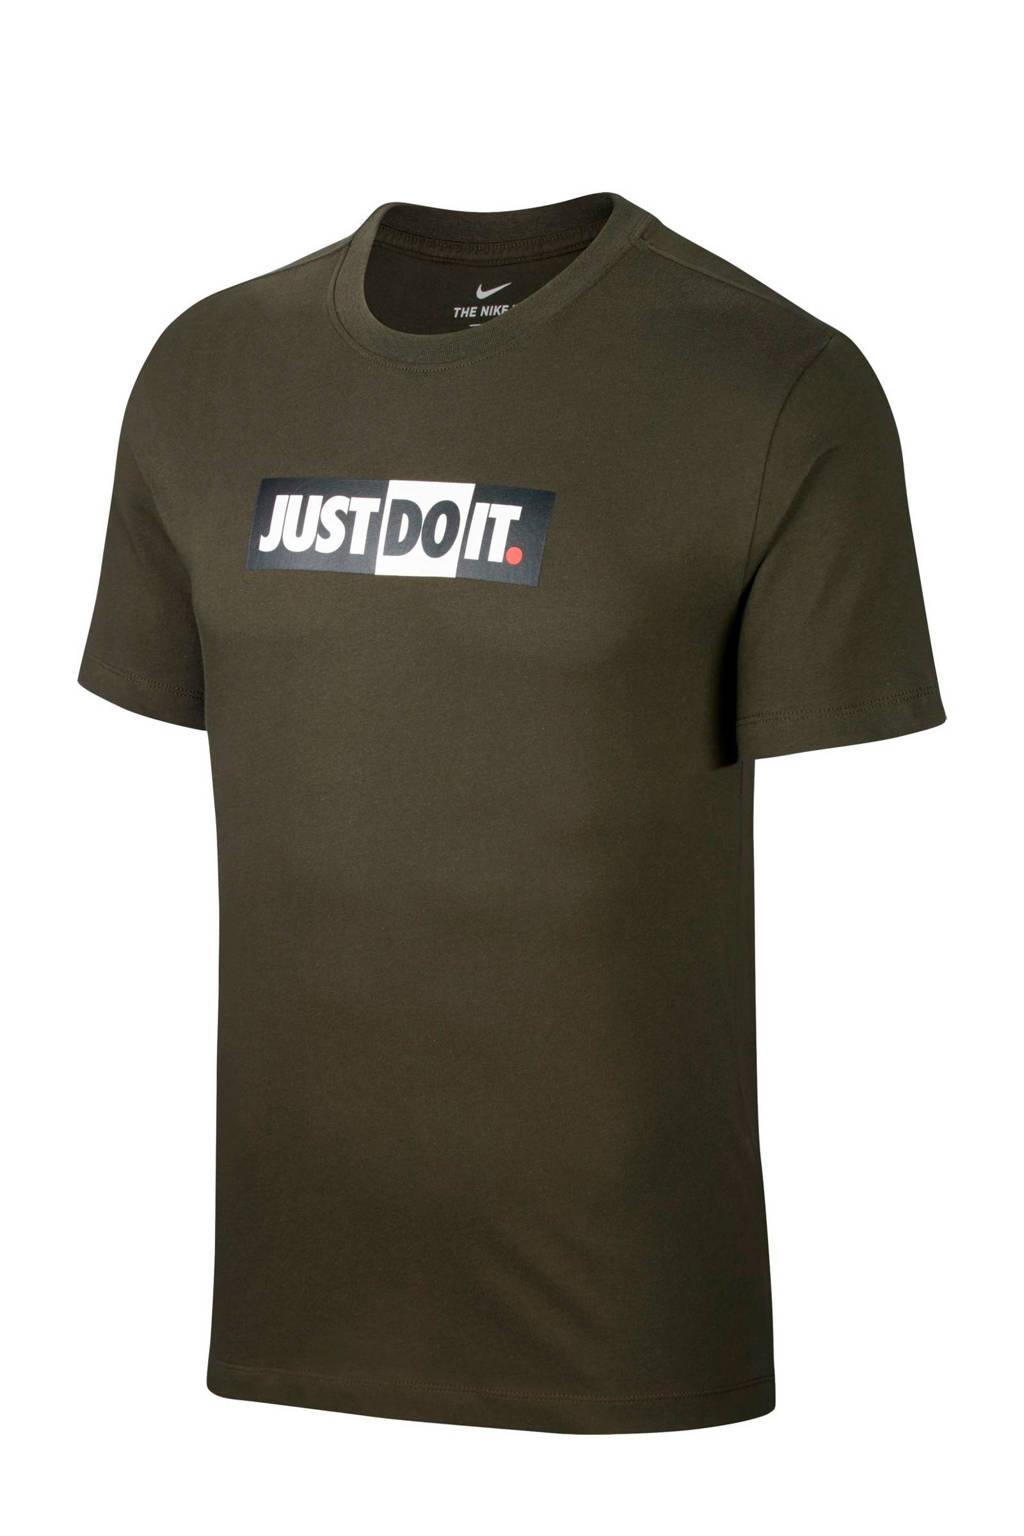 Nike   T-shirt grijs kaki, Kaki